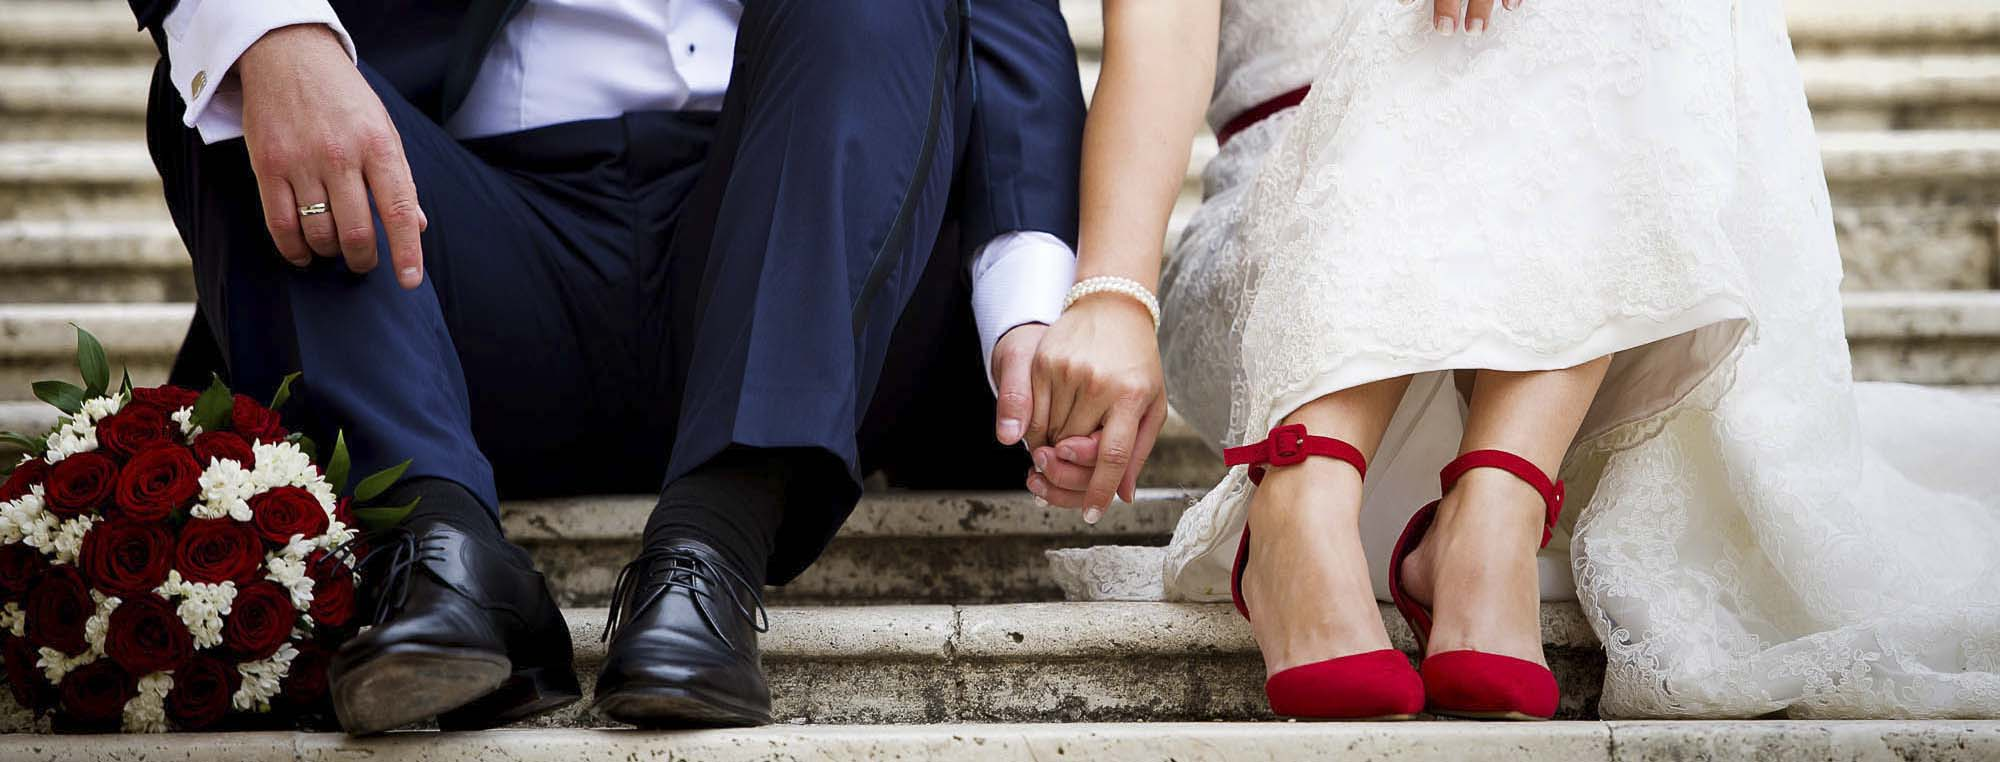 fotografo-matrimonio-video-matrimonio romagnano sesia